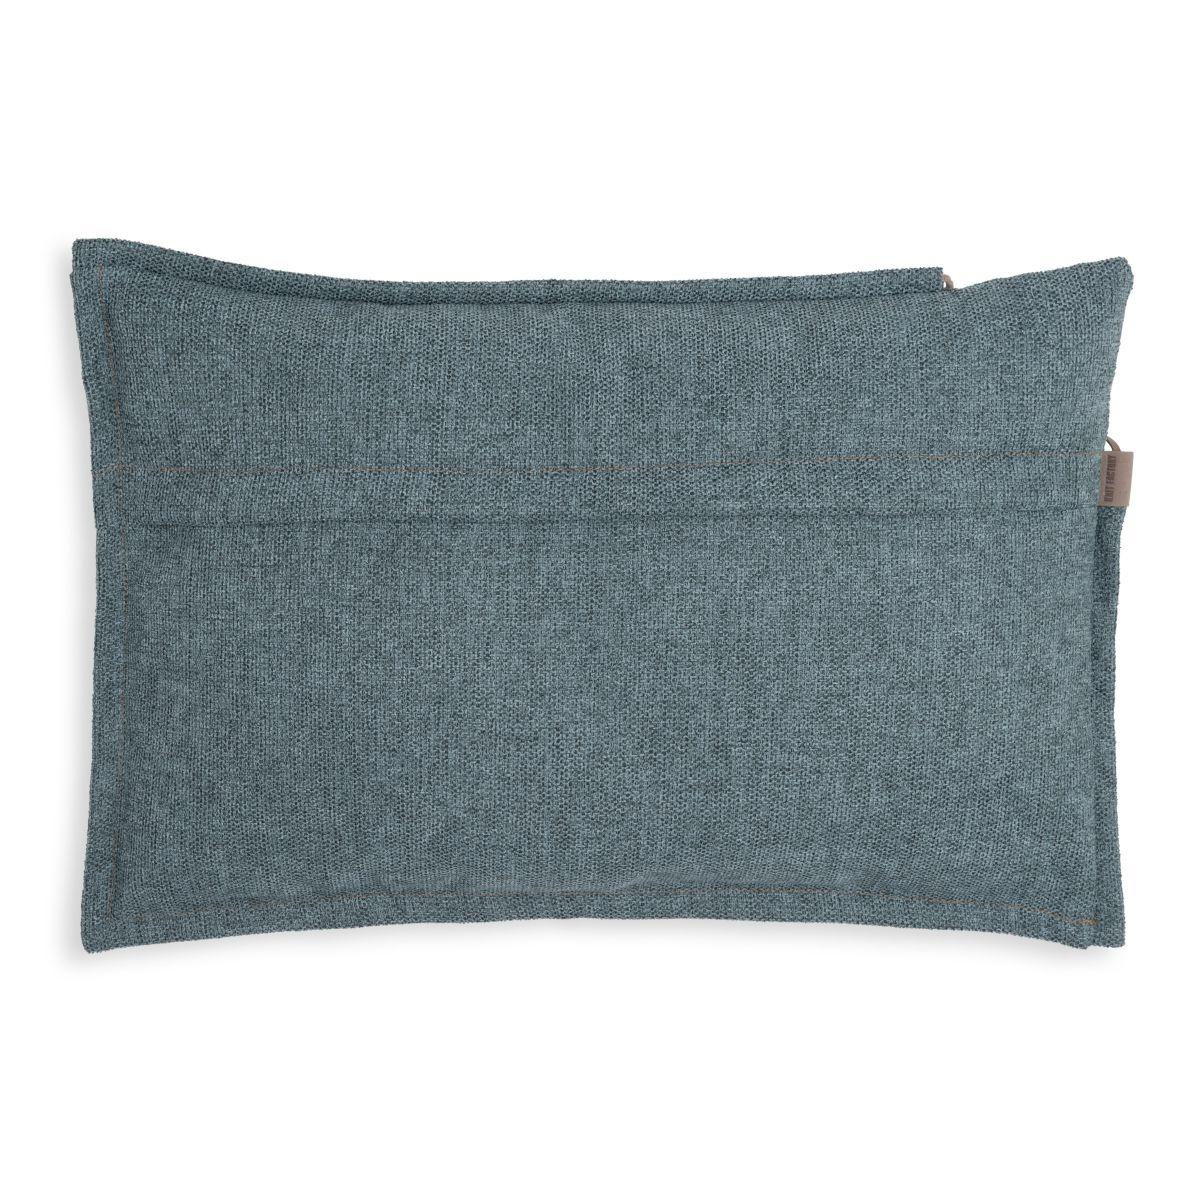 knit factory kf153013013 imre kussen jeans 60x40 2